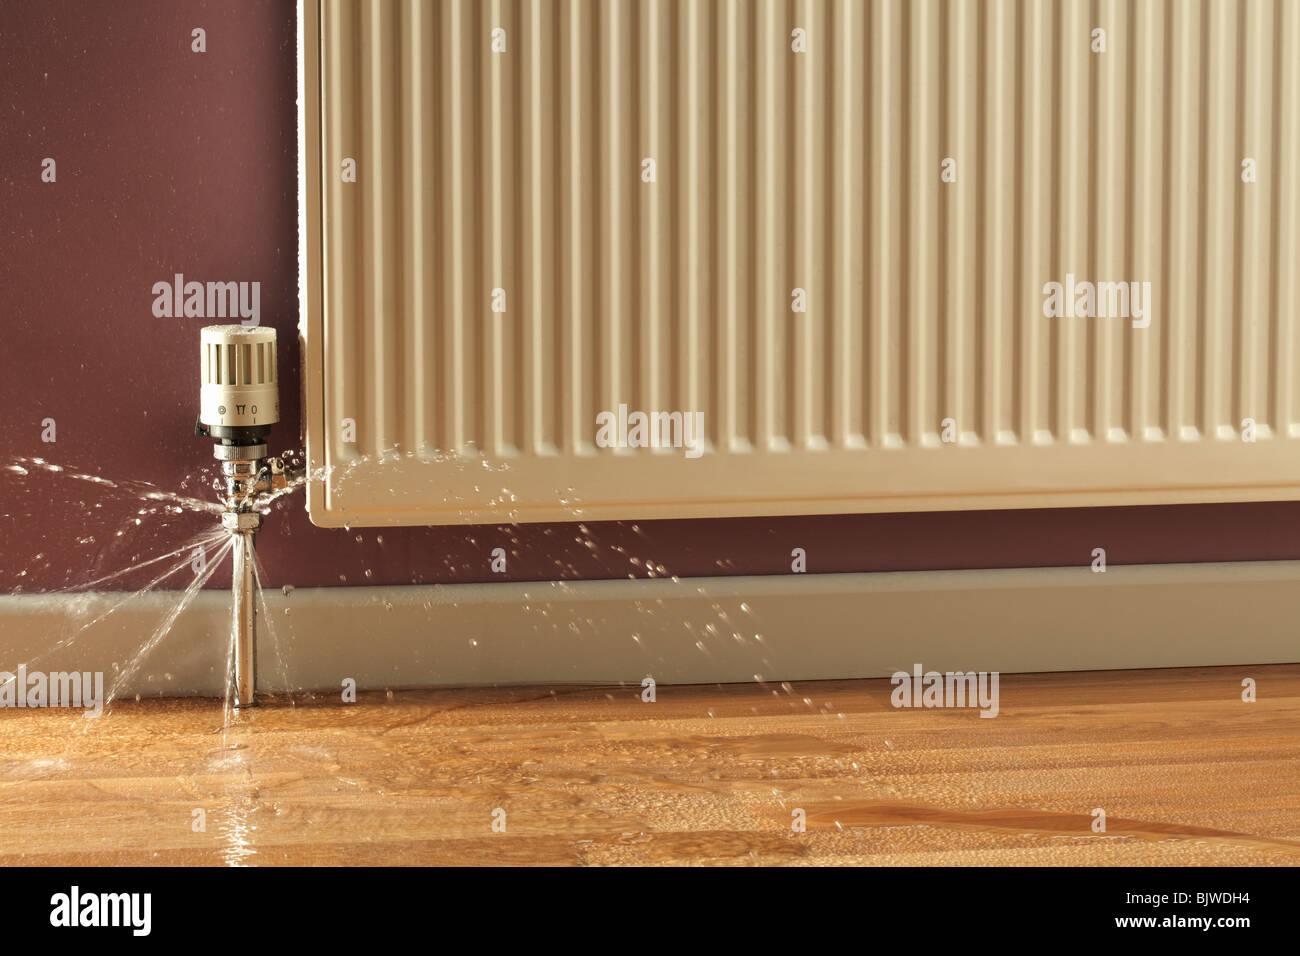 Leaking Radiator Pipes - Stock Image